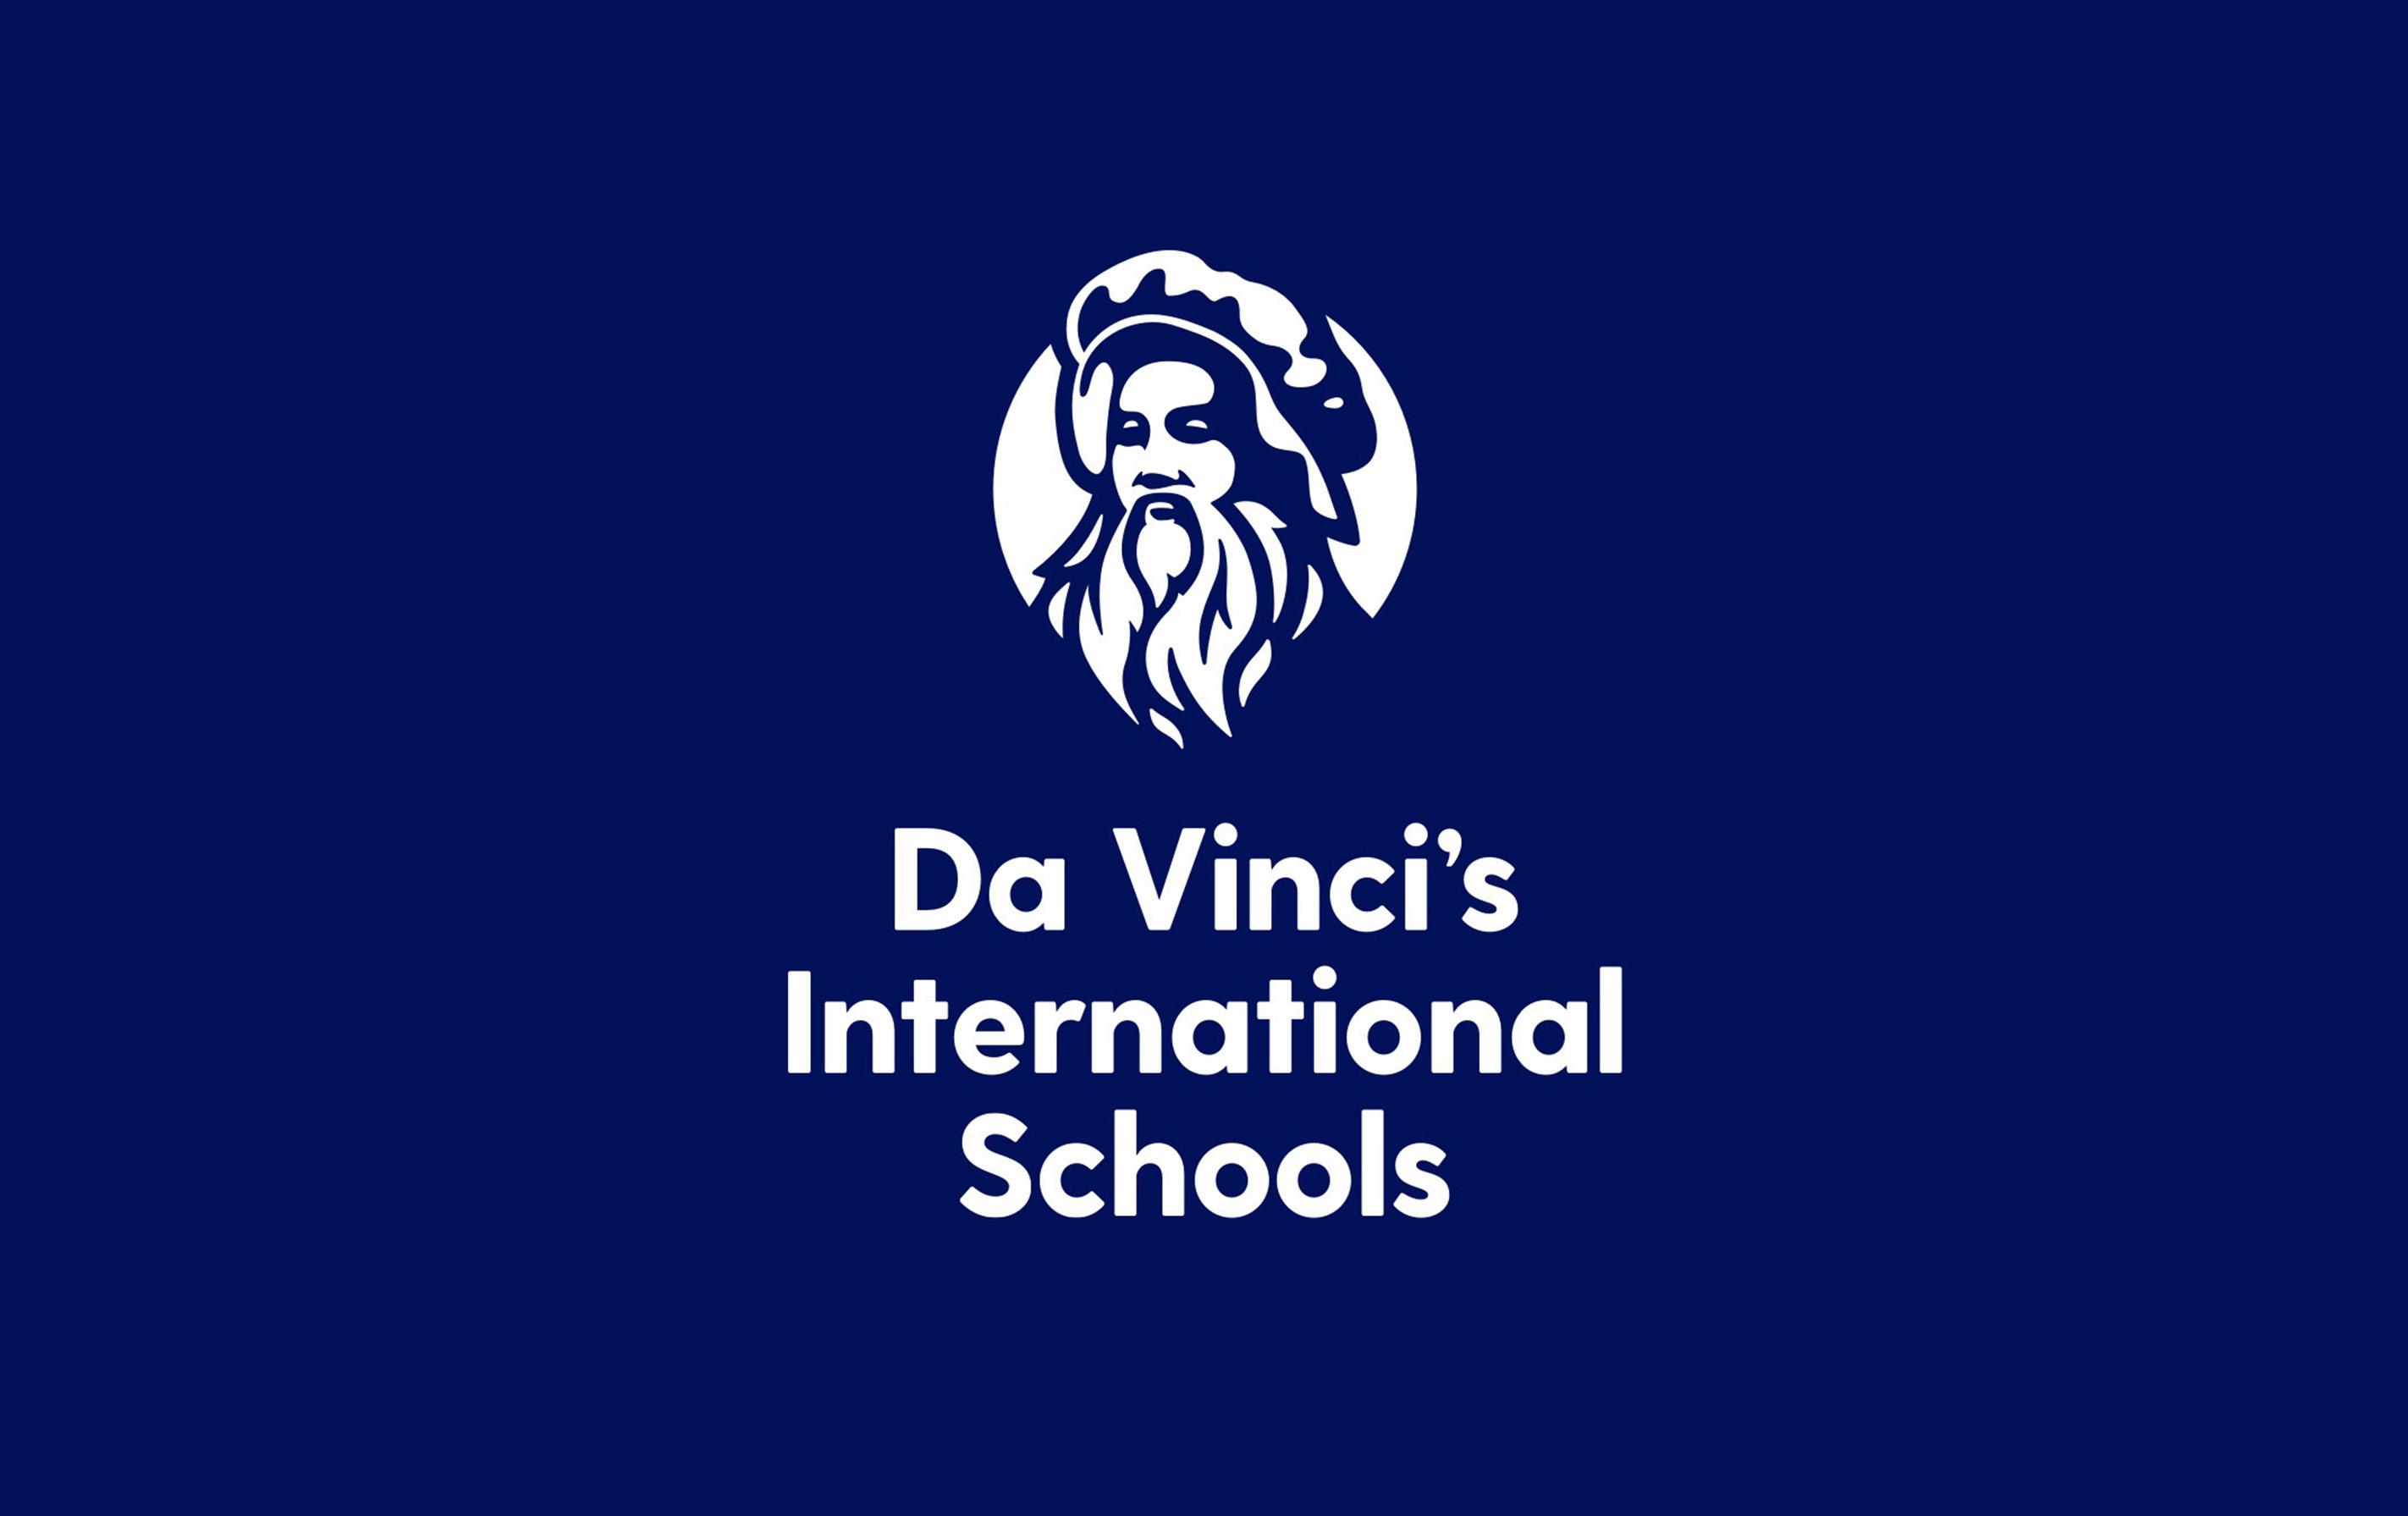 Da Vinci's International School